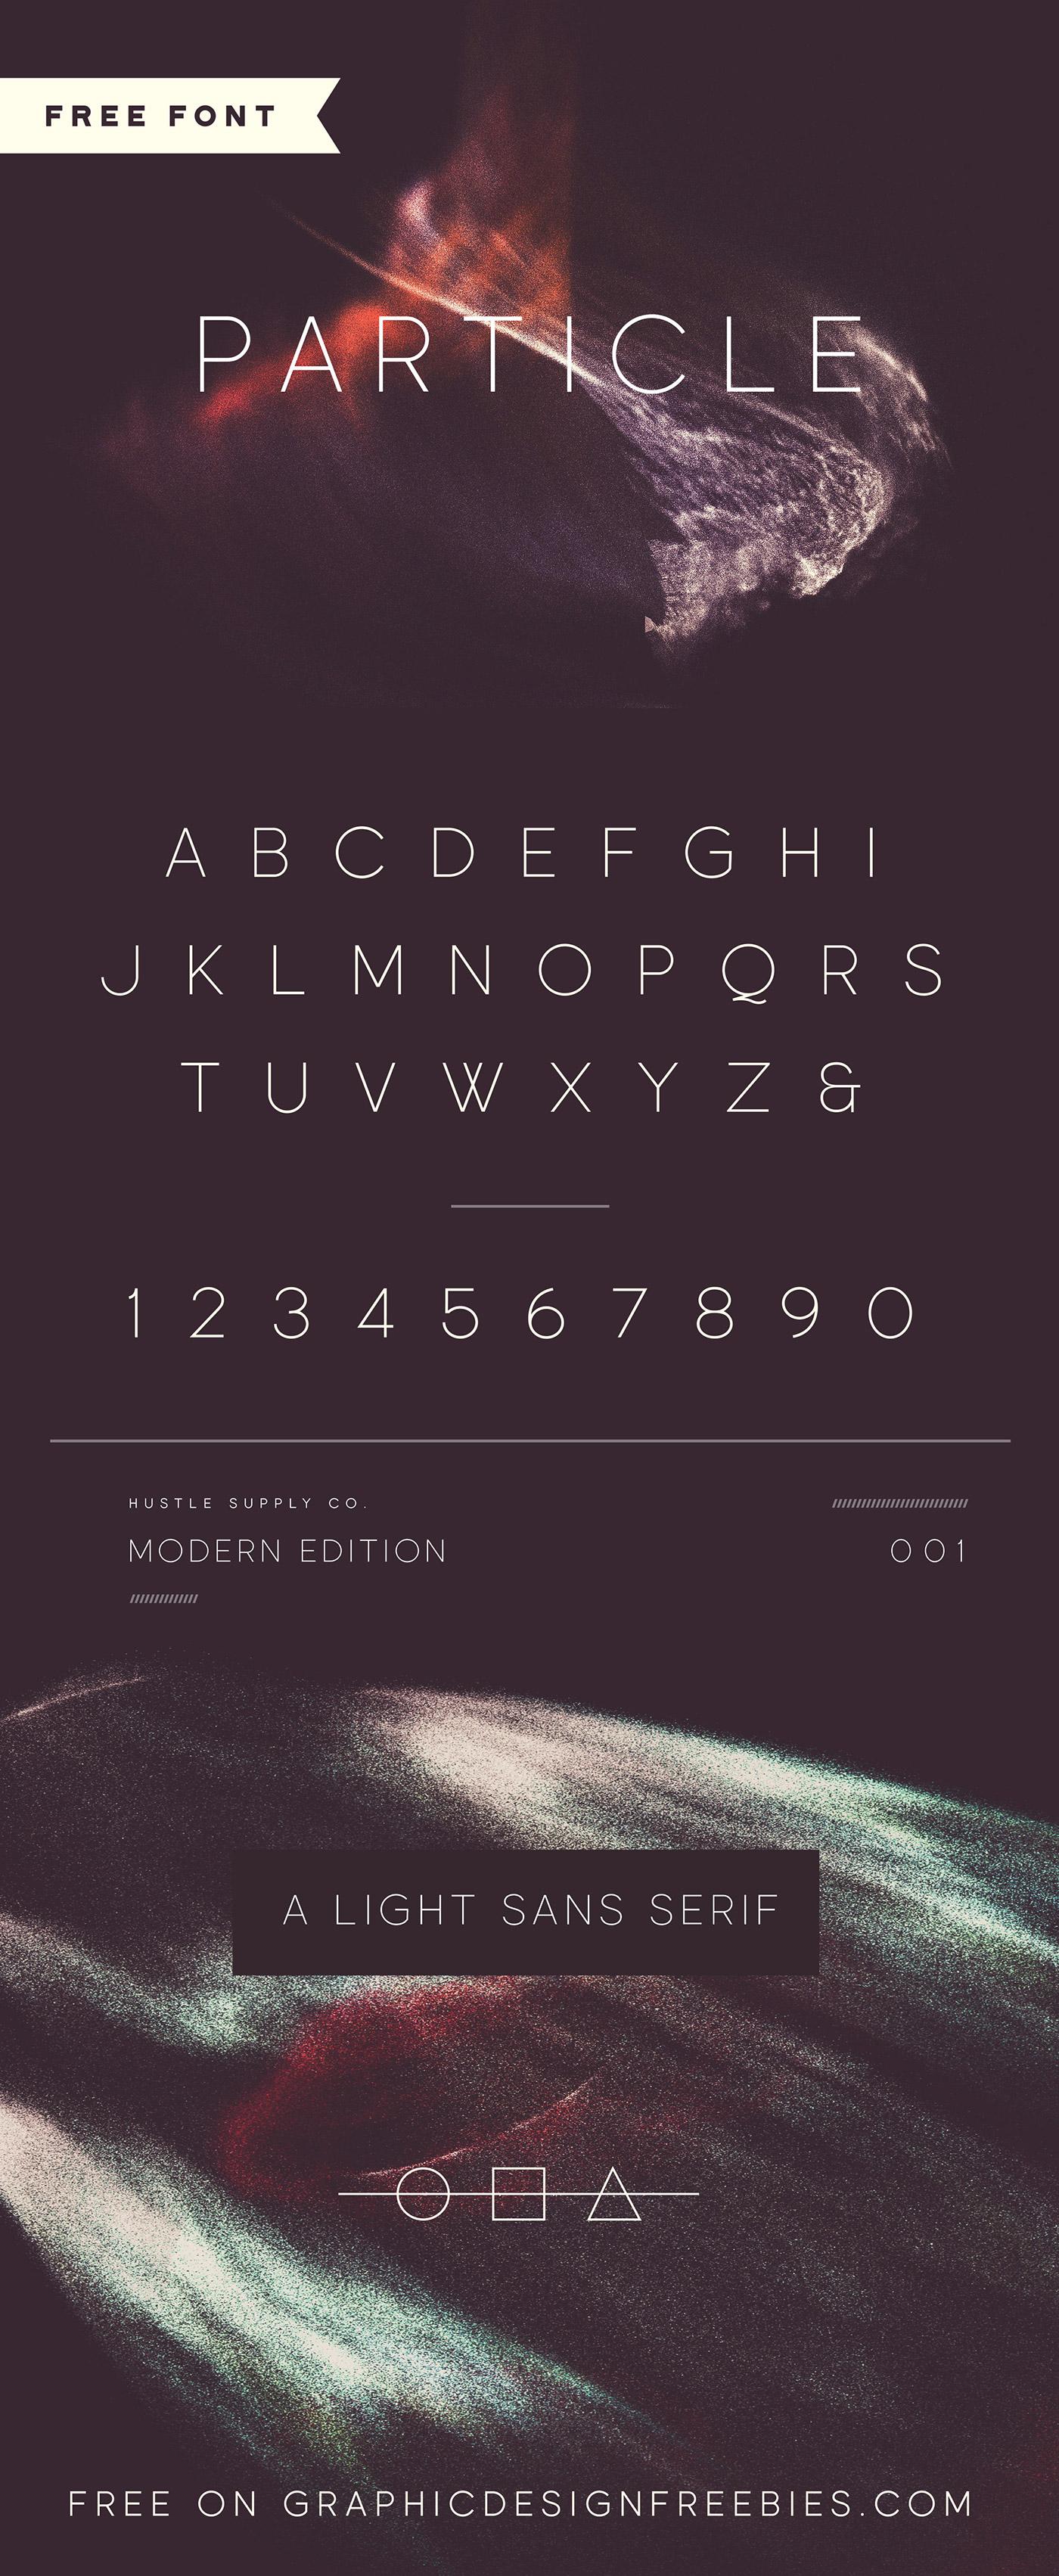 free Free font freebie font sans serif sans design type Typeface modern